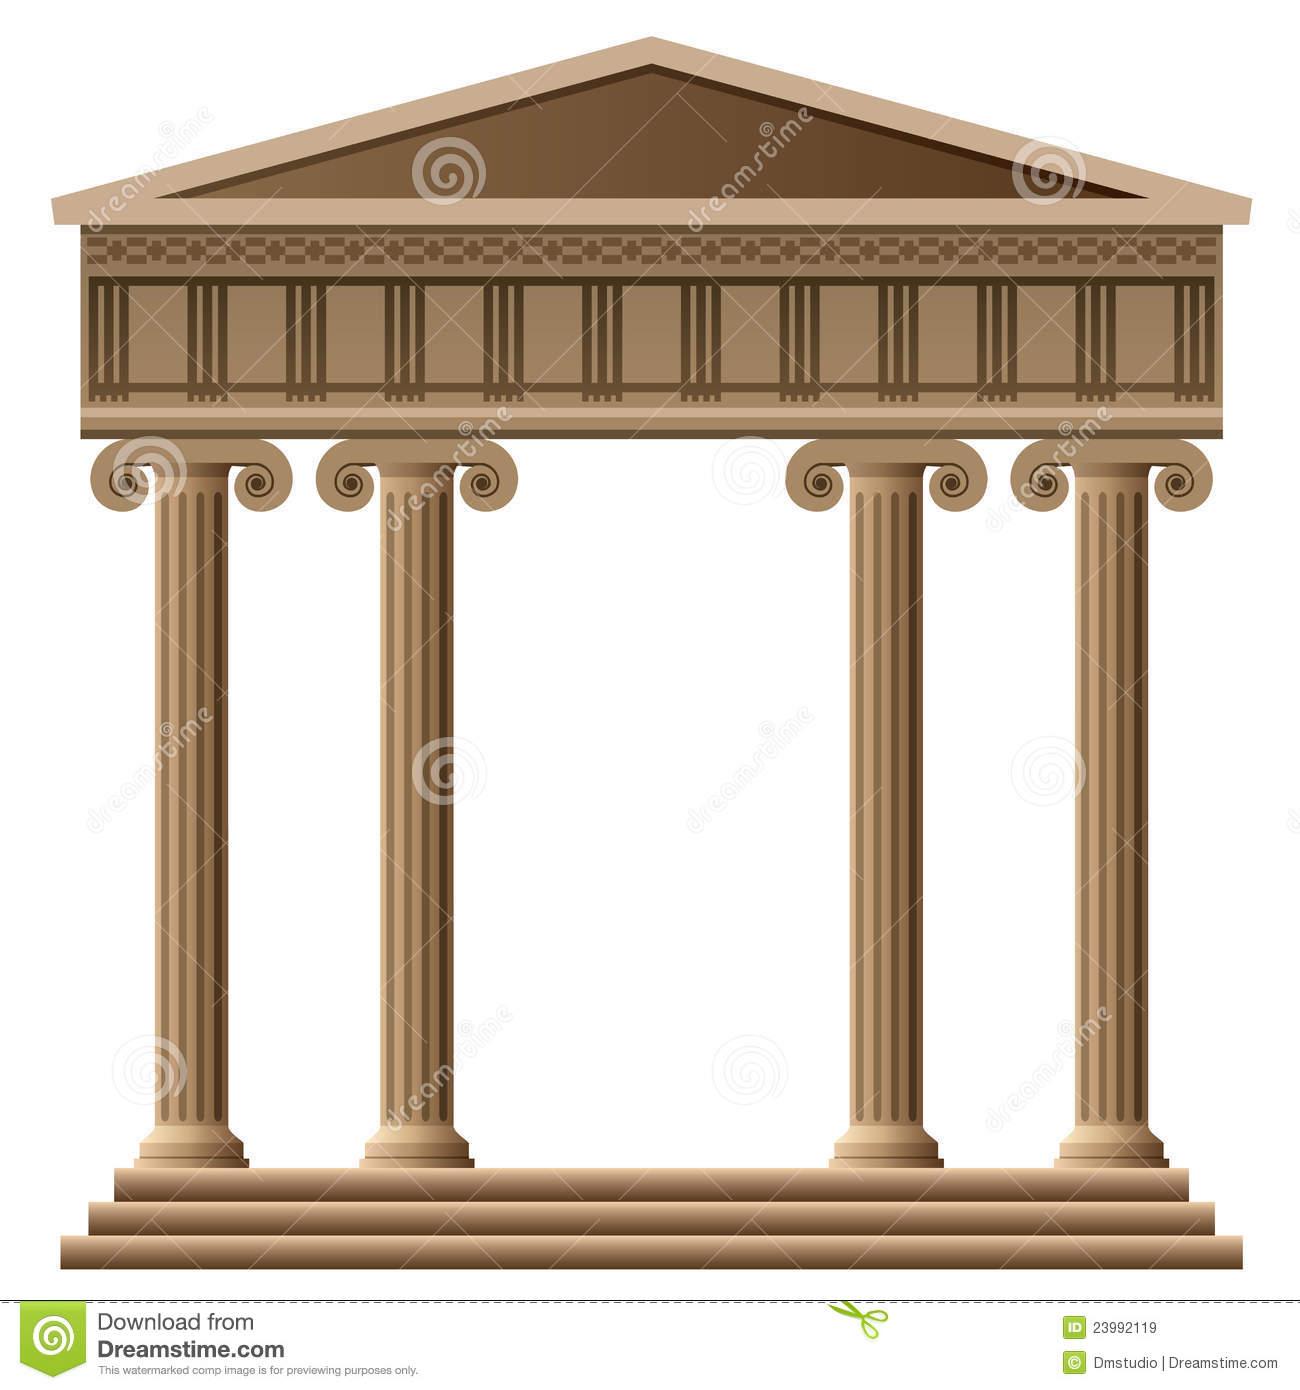 Greek Buildings Clipart - Clipart Suggest